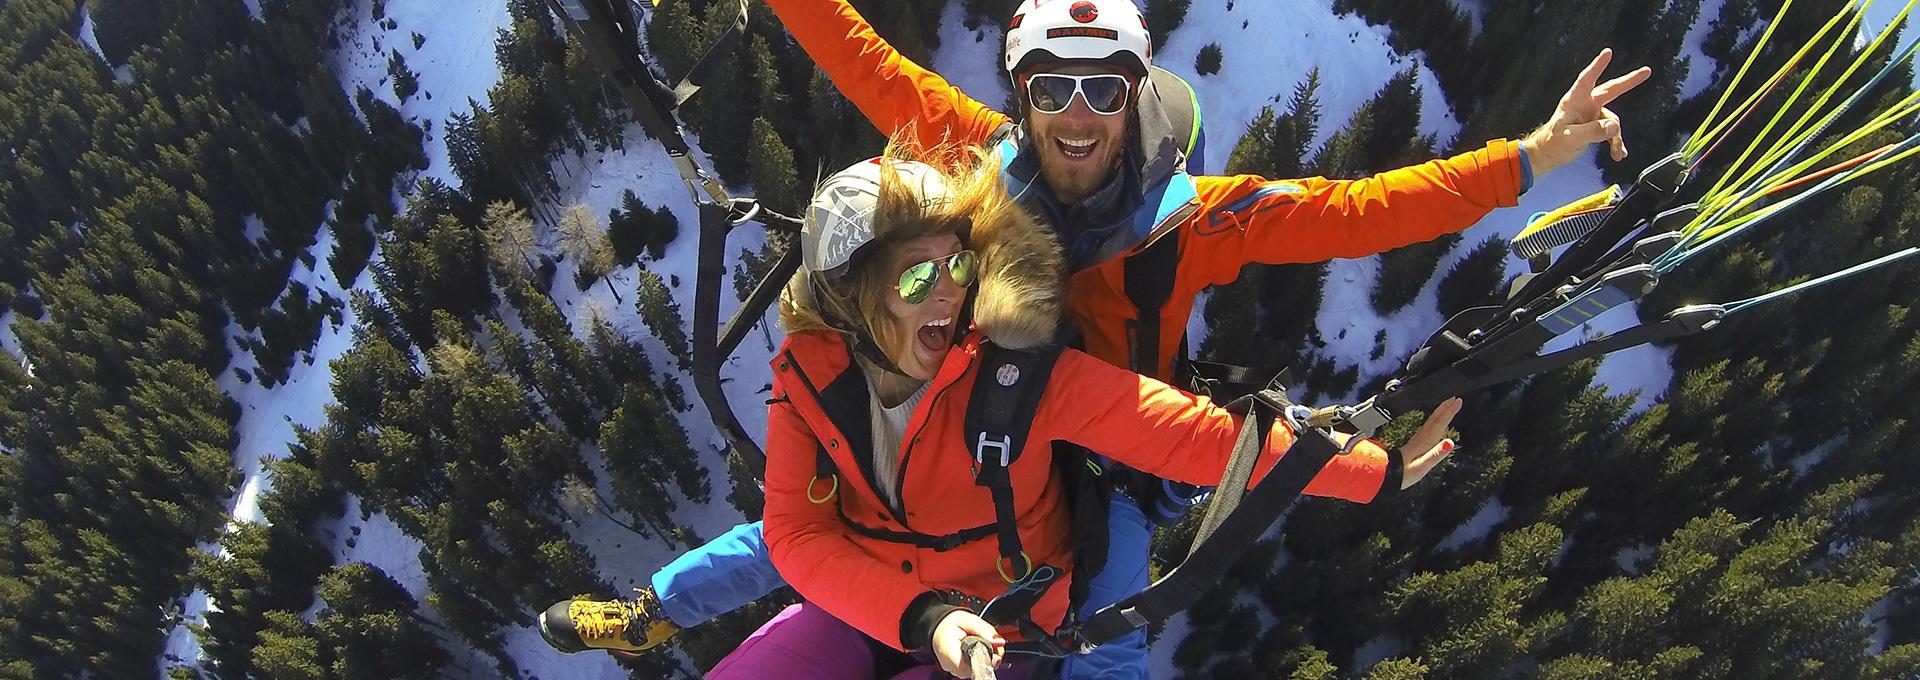 Val Gardena - Southtyrol paragliding